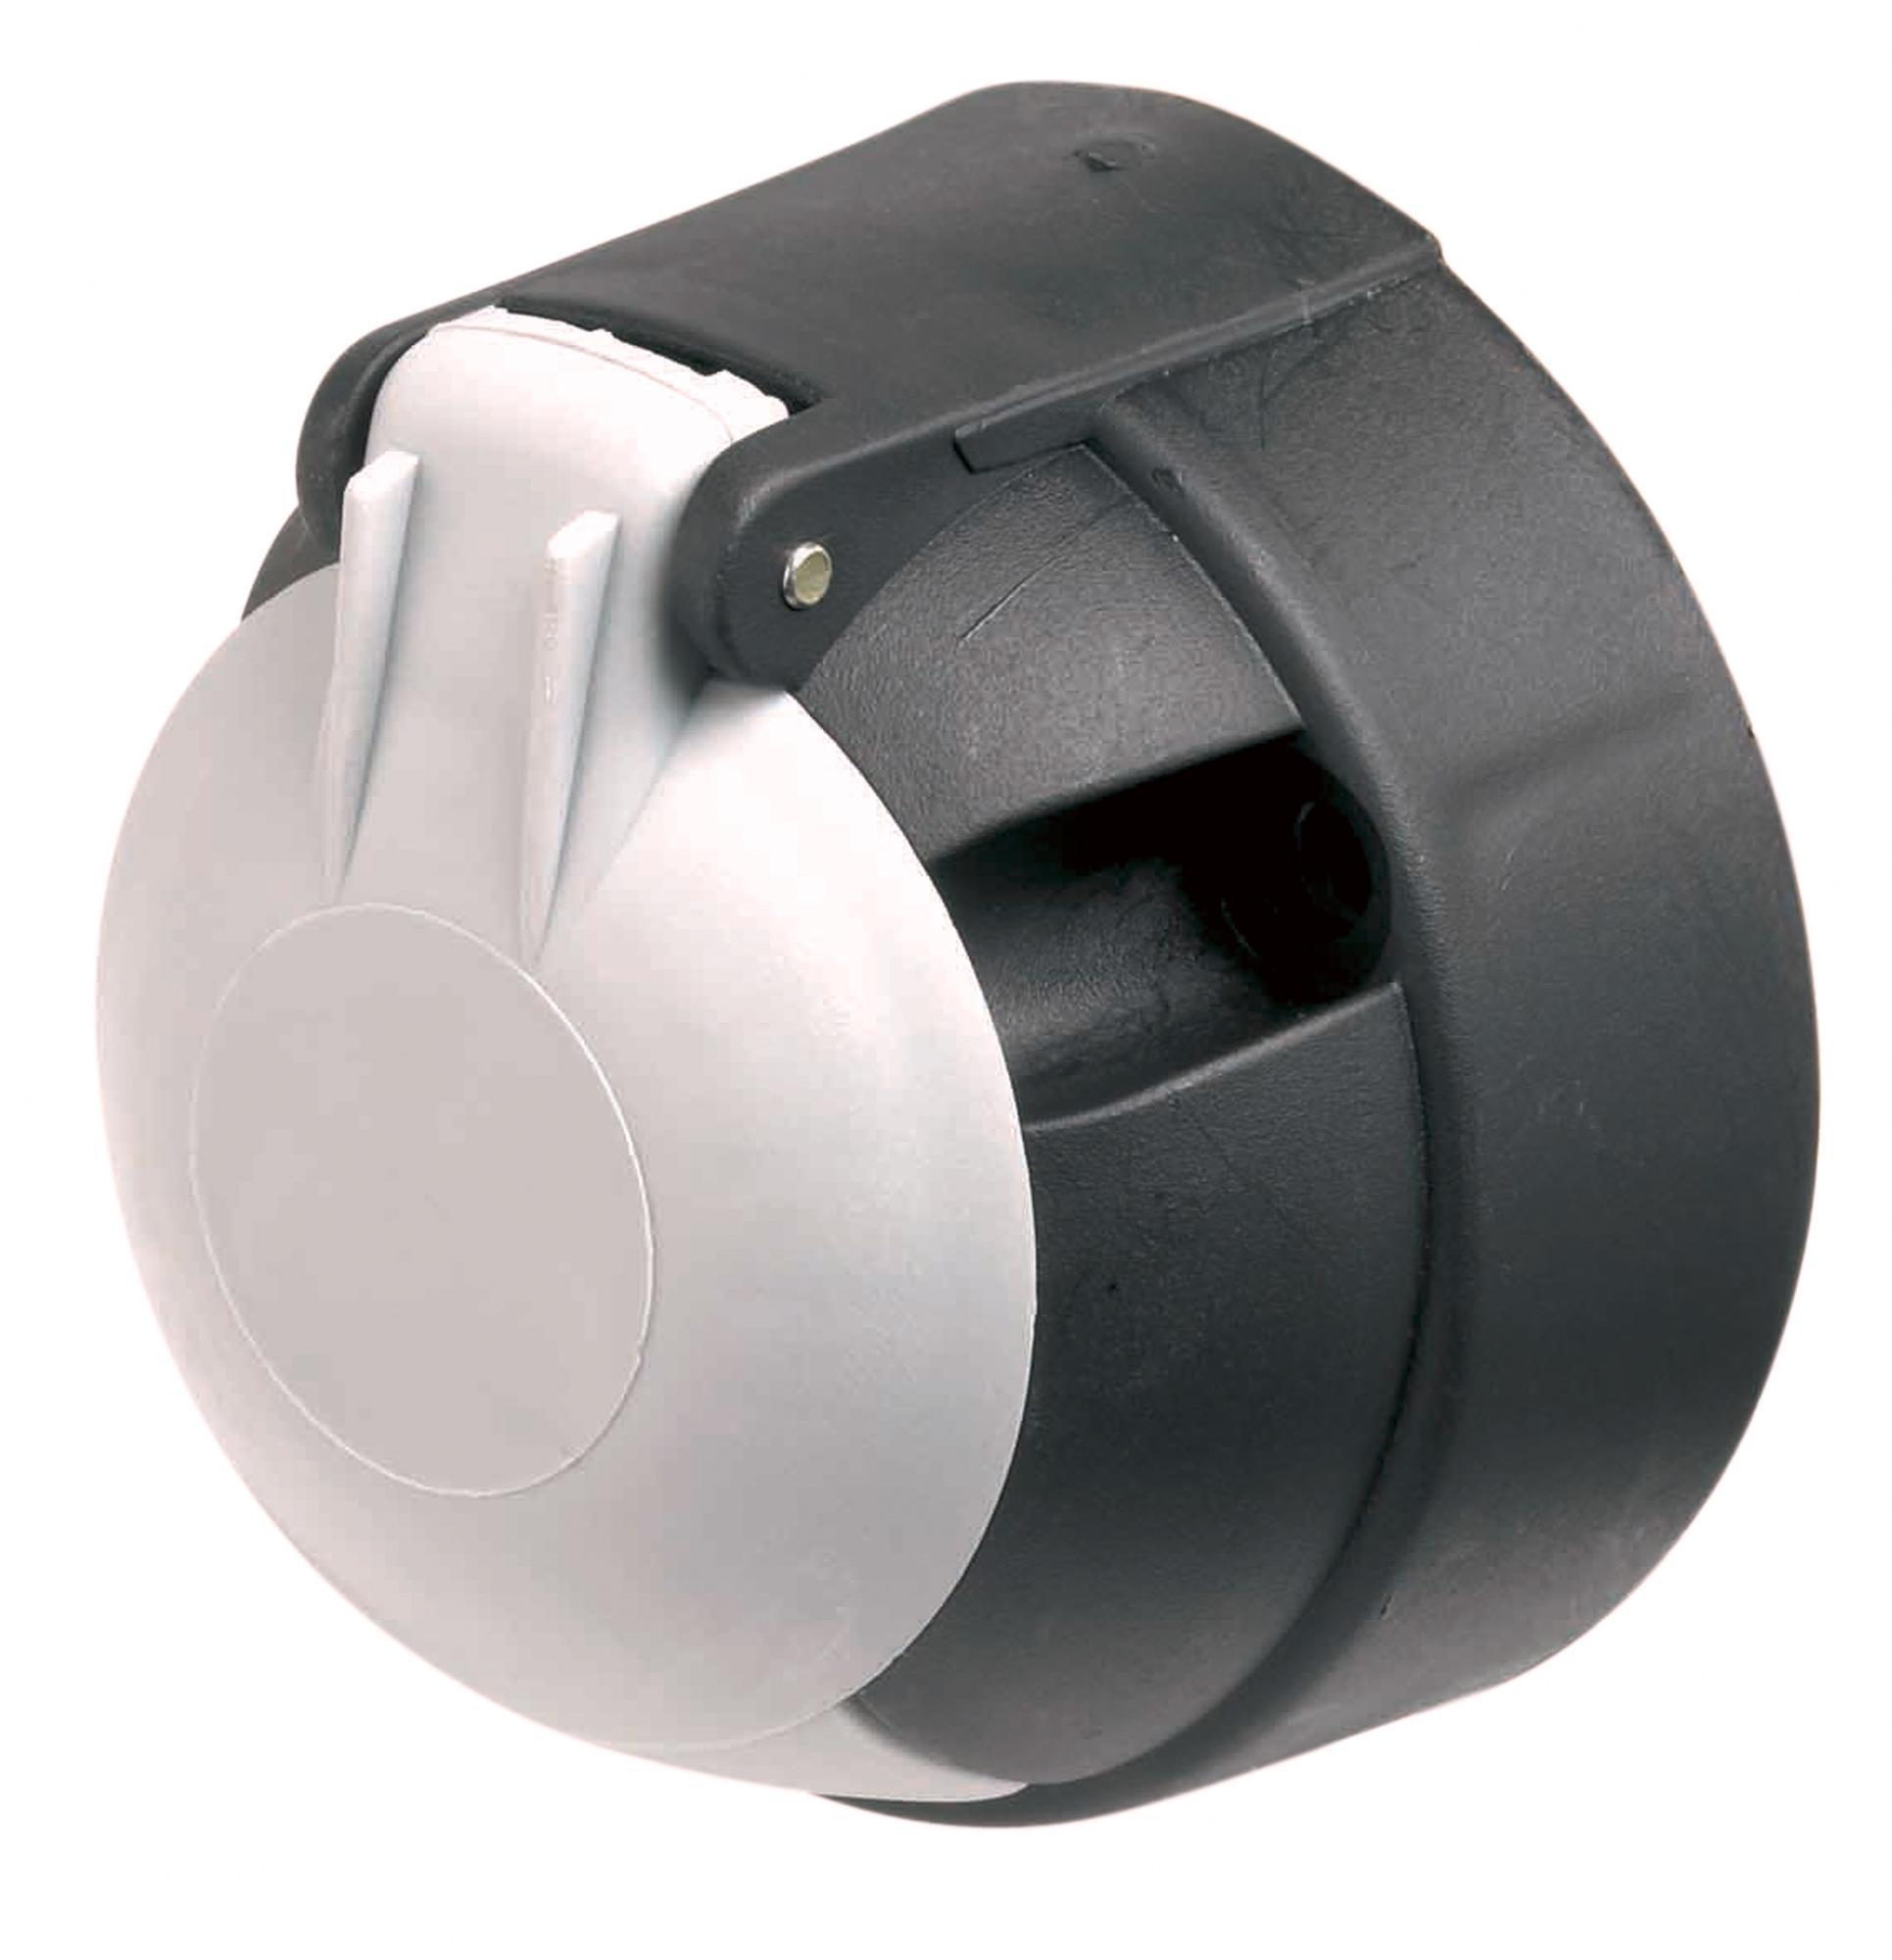 Ring pin socket v s plastic black white cap electric